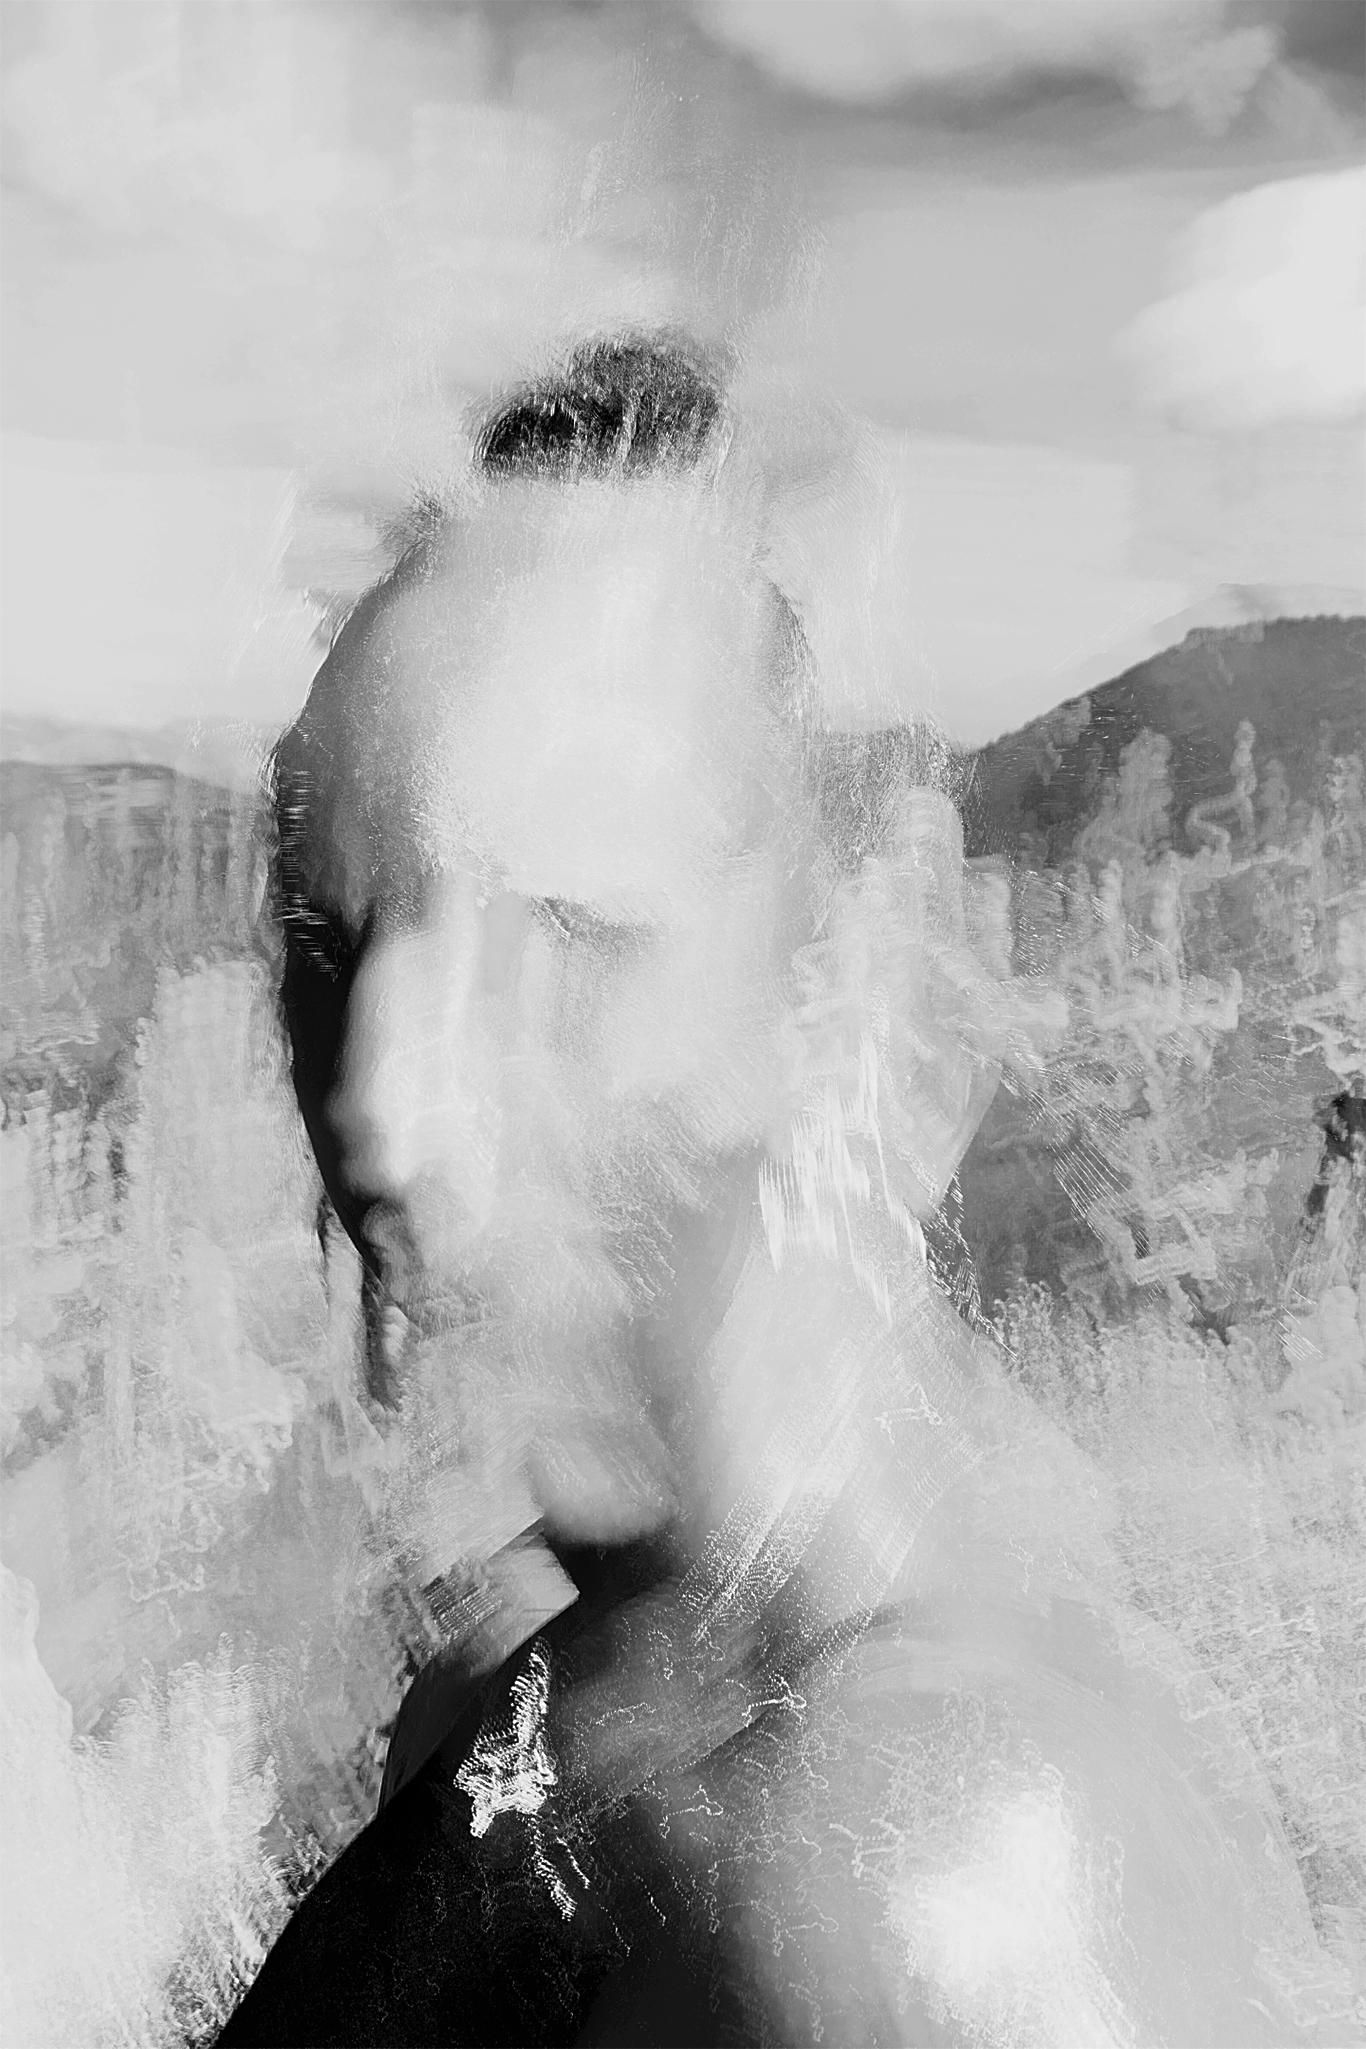 BMJ_The_Vanishing_Native